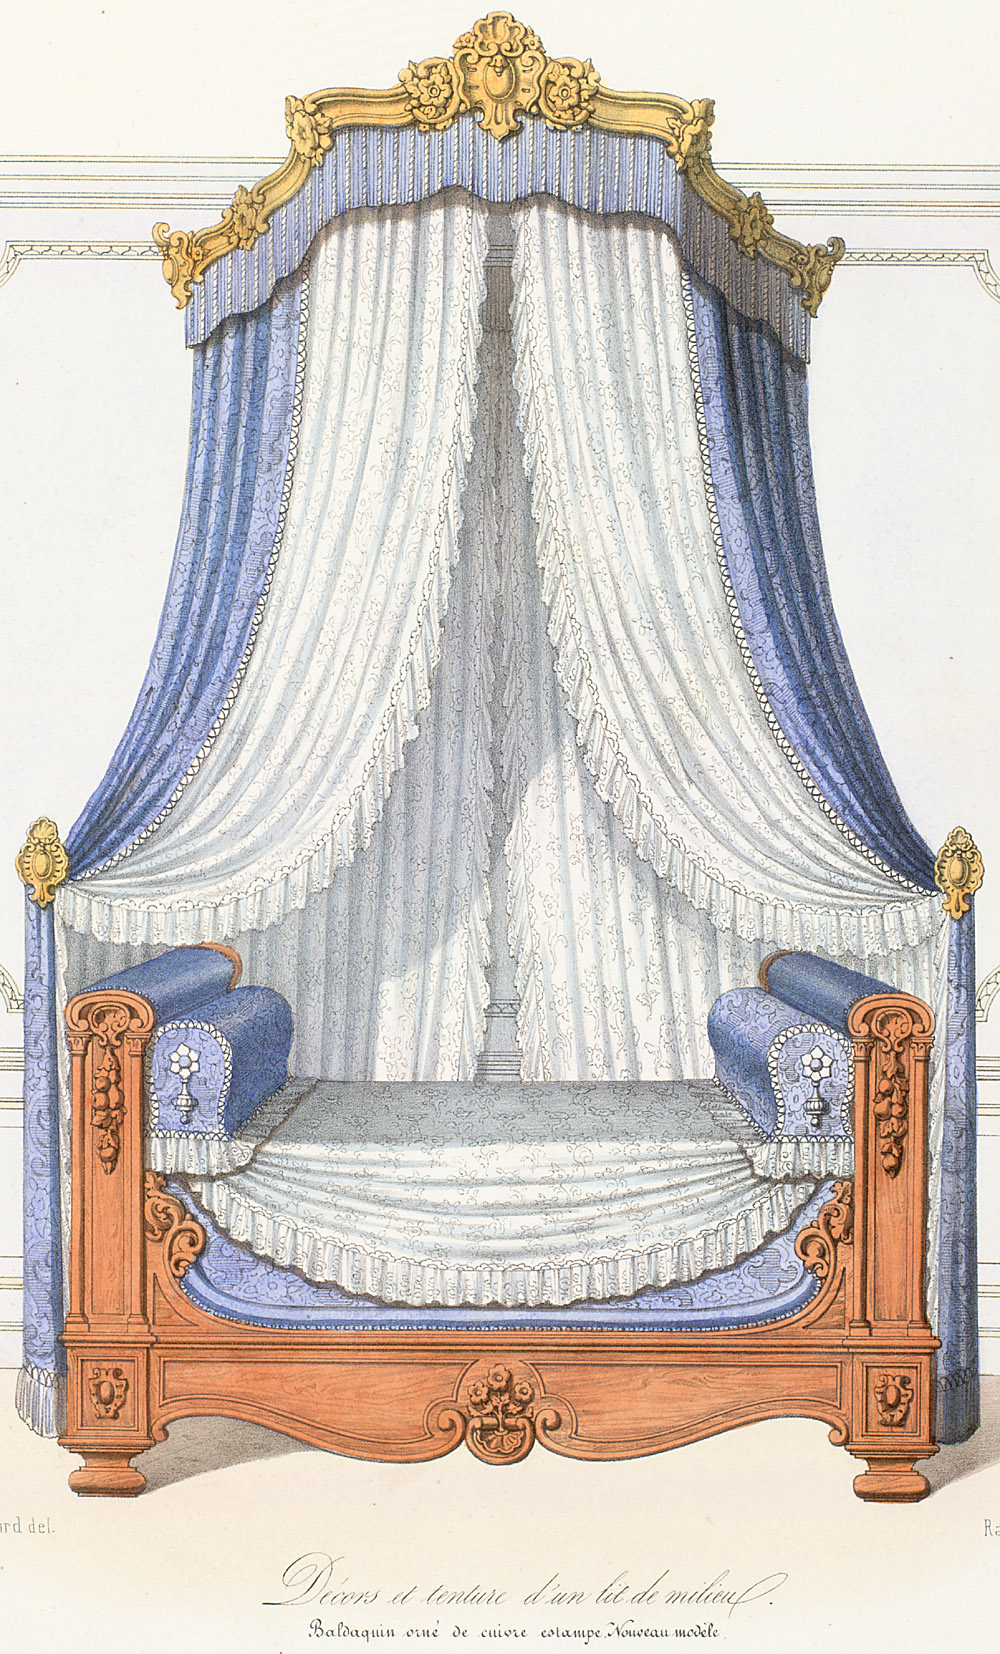 Beds (furniture),  Image number:SIL12-2-197b